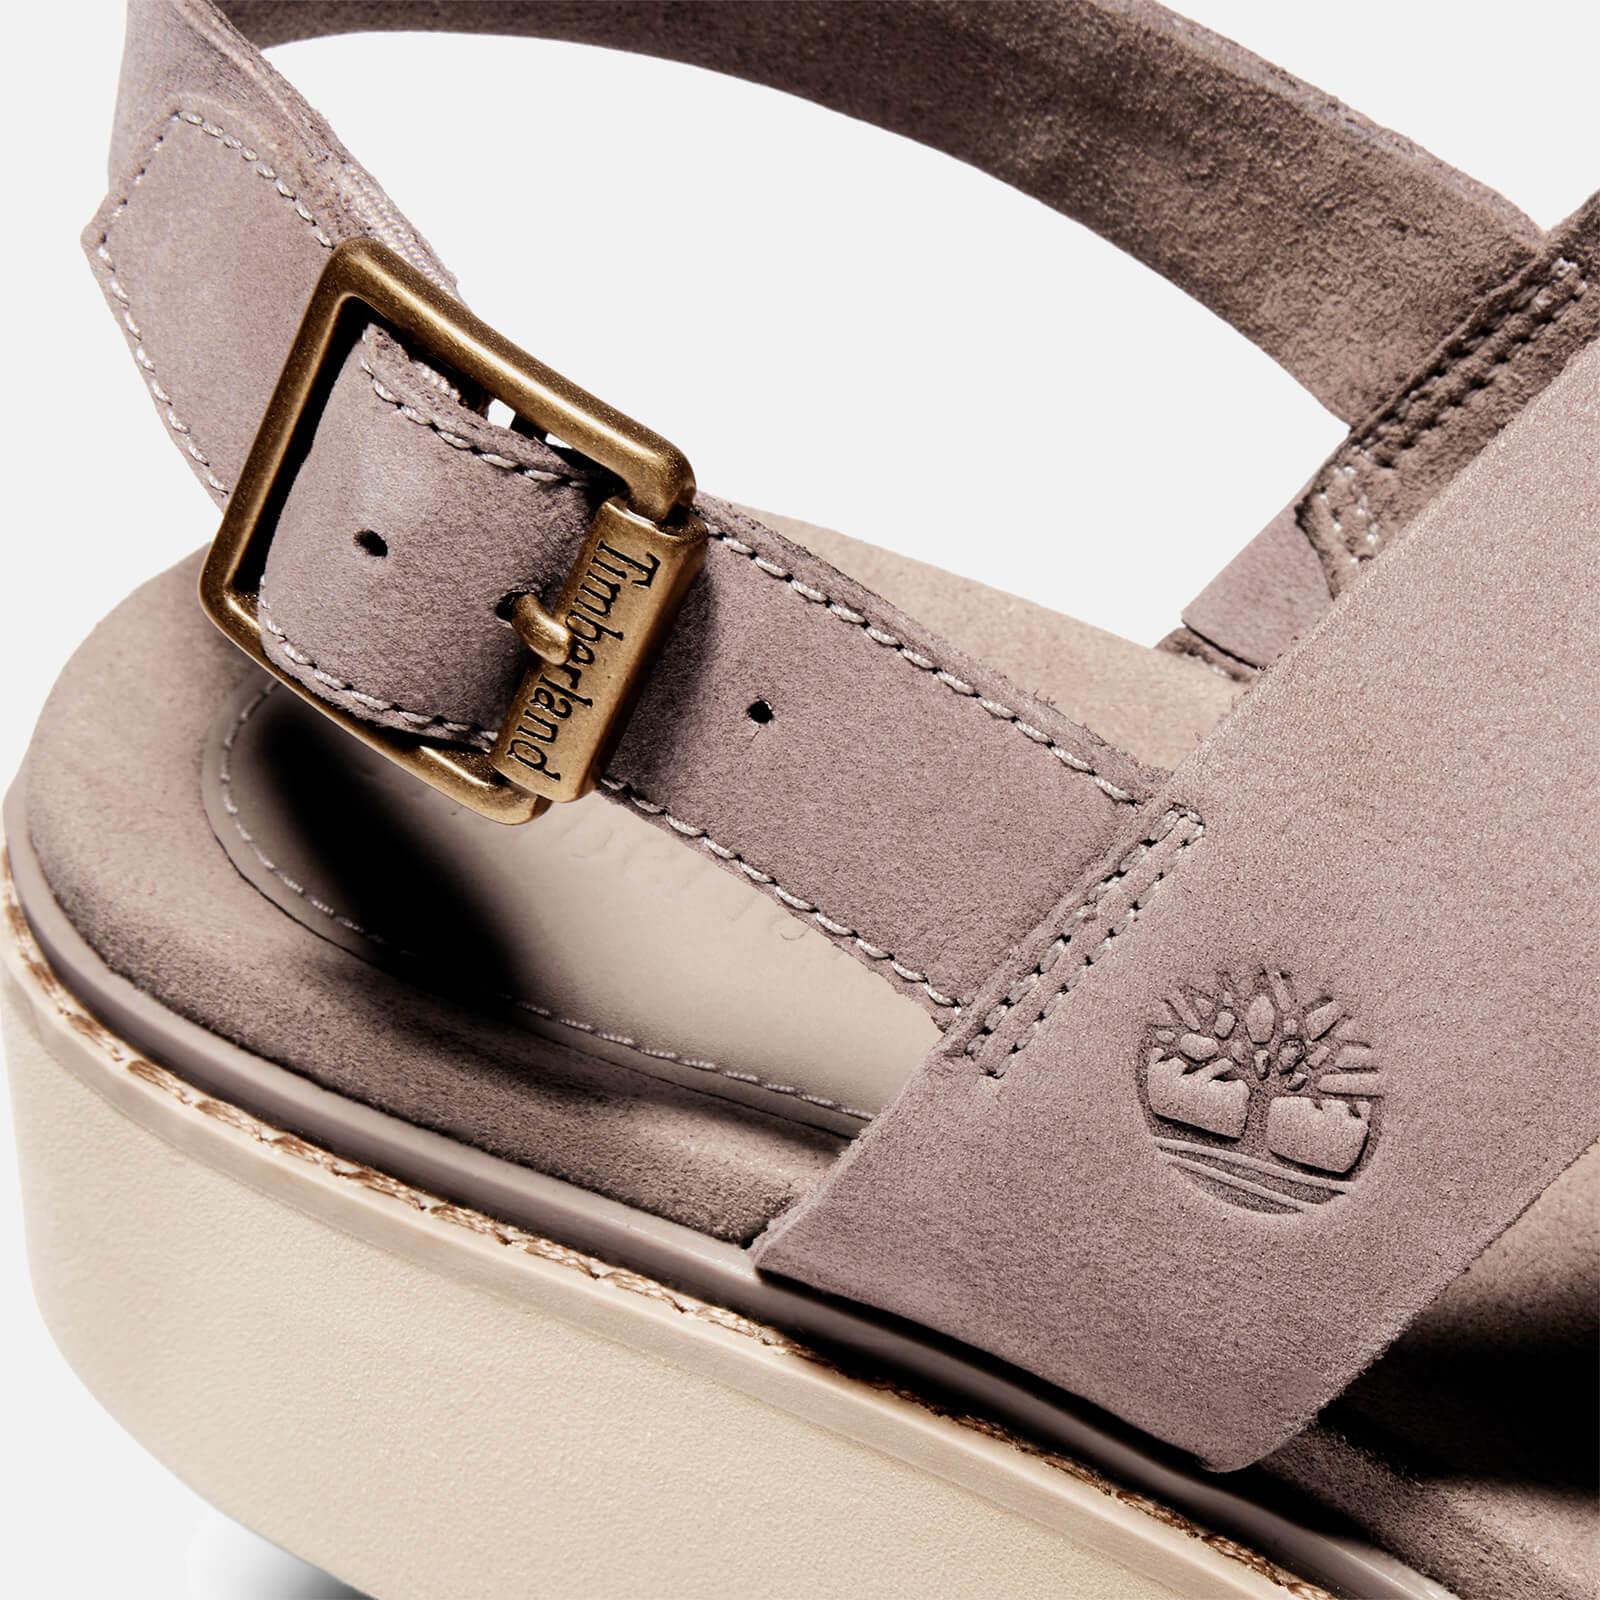 Timberland Women's Safari Dawn Flatform Sandals - Taupe - Uk 3.5